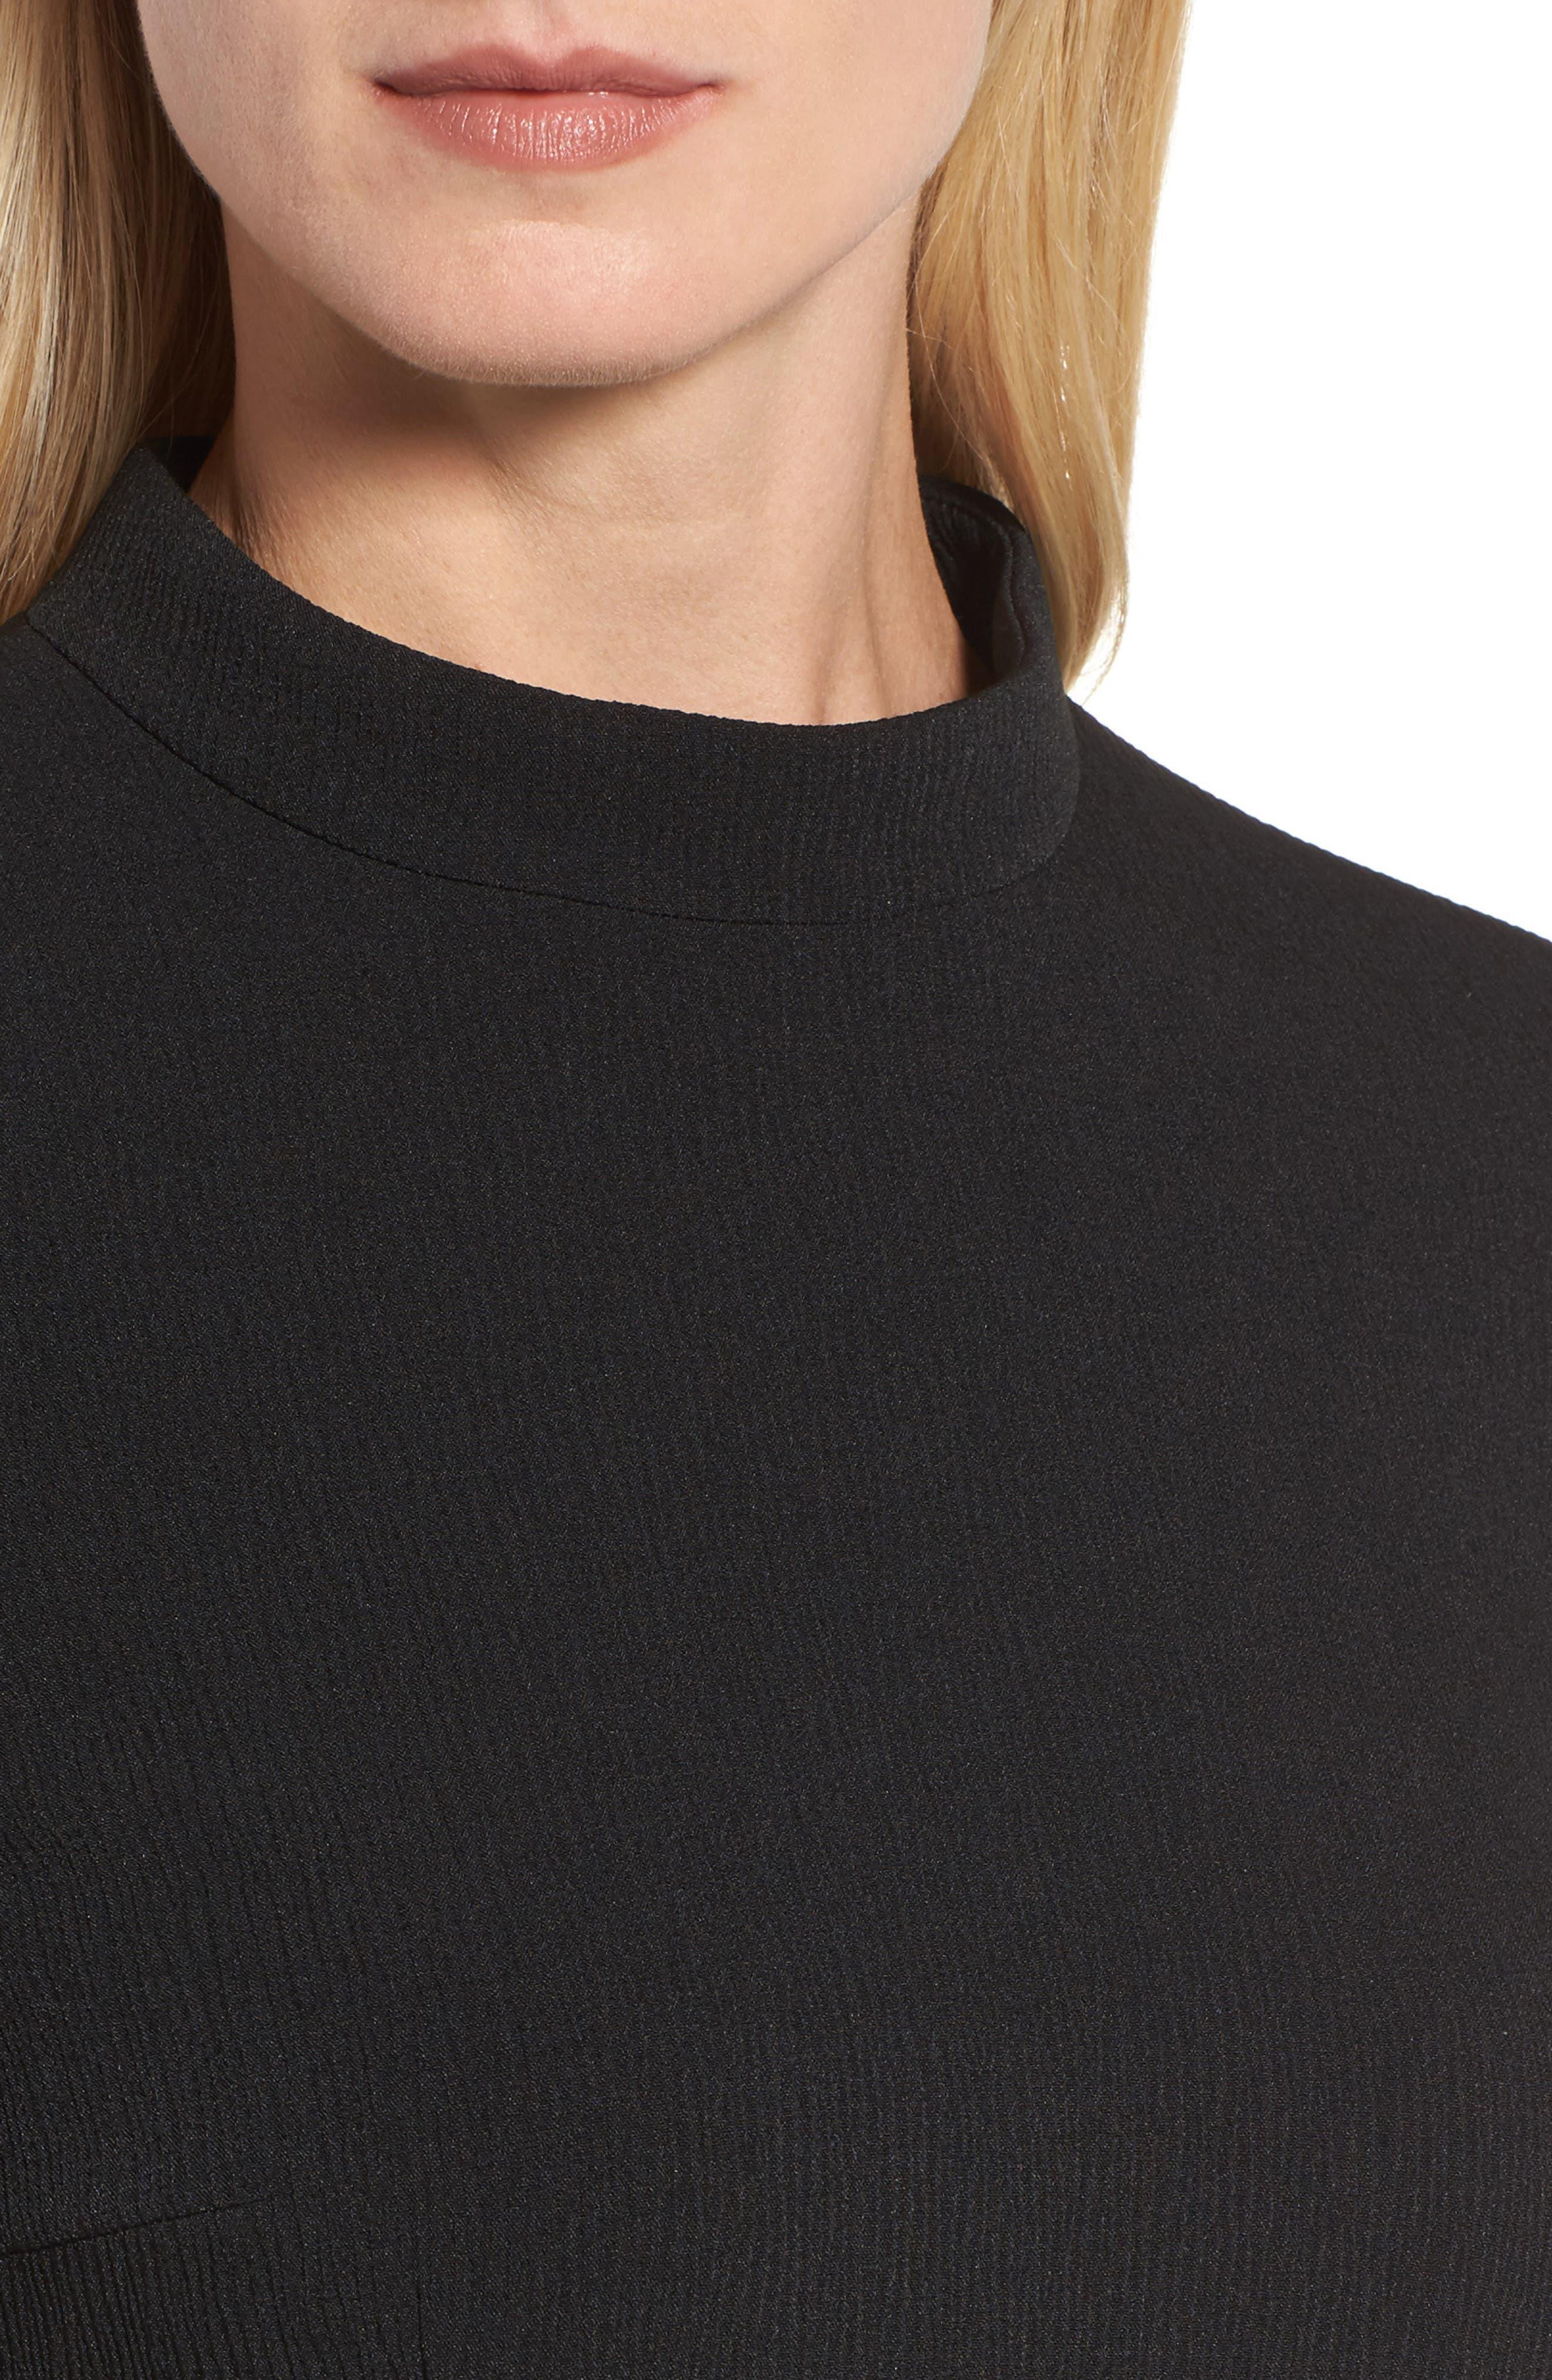 Dadena Crepe Sheath Dress,                             Alternate thumbnail 4, color,                             Black